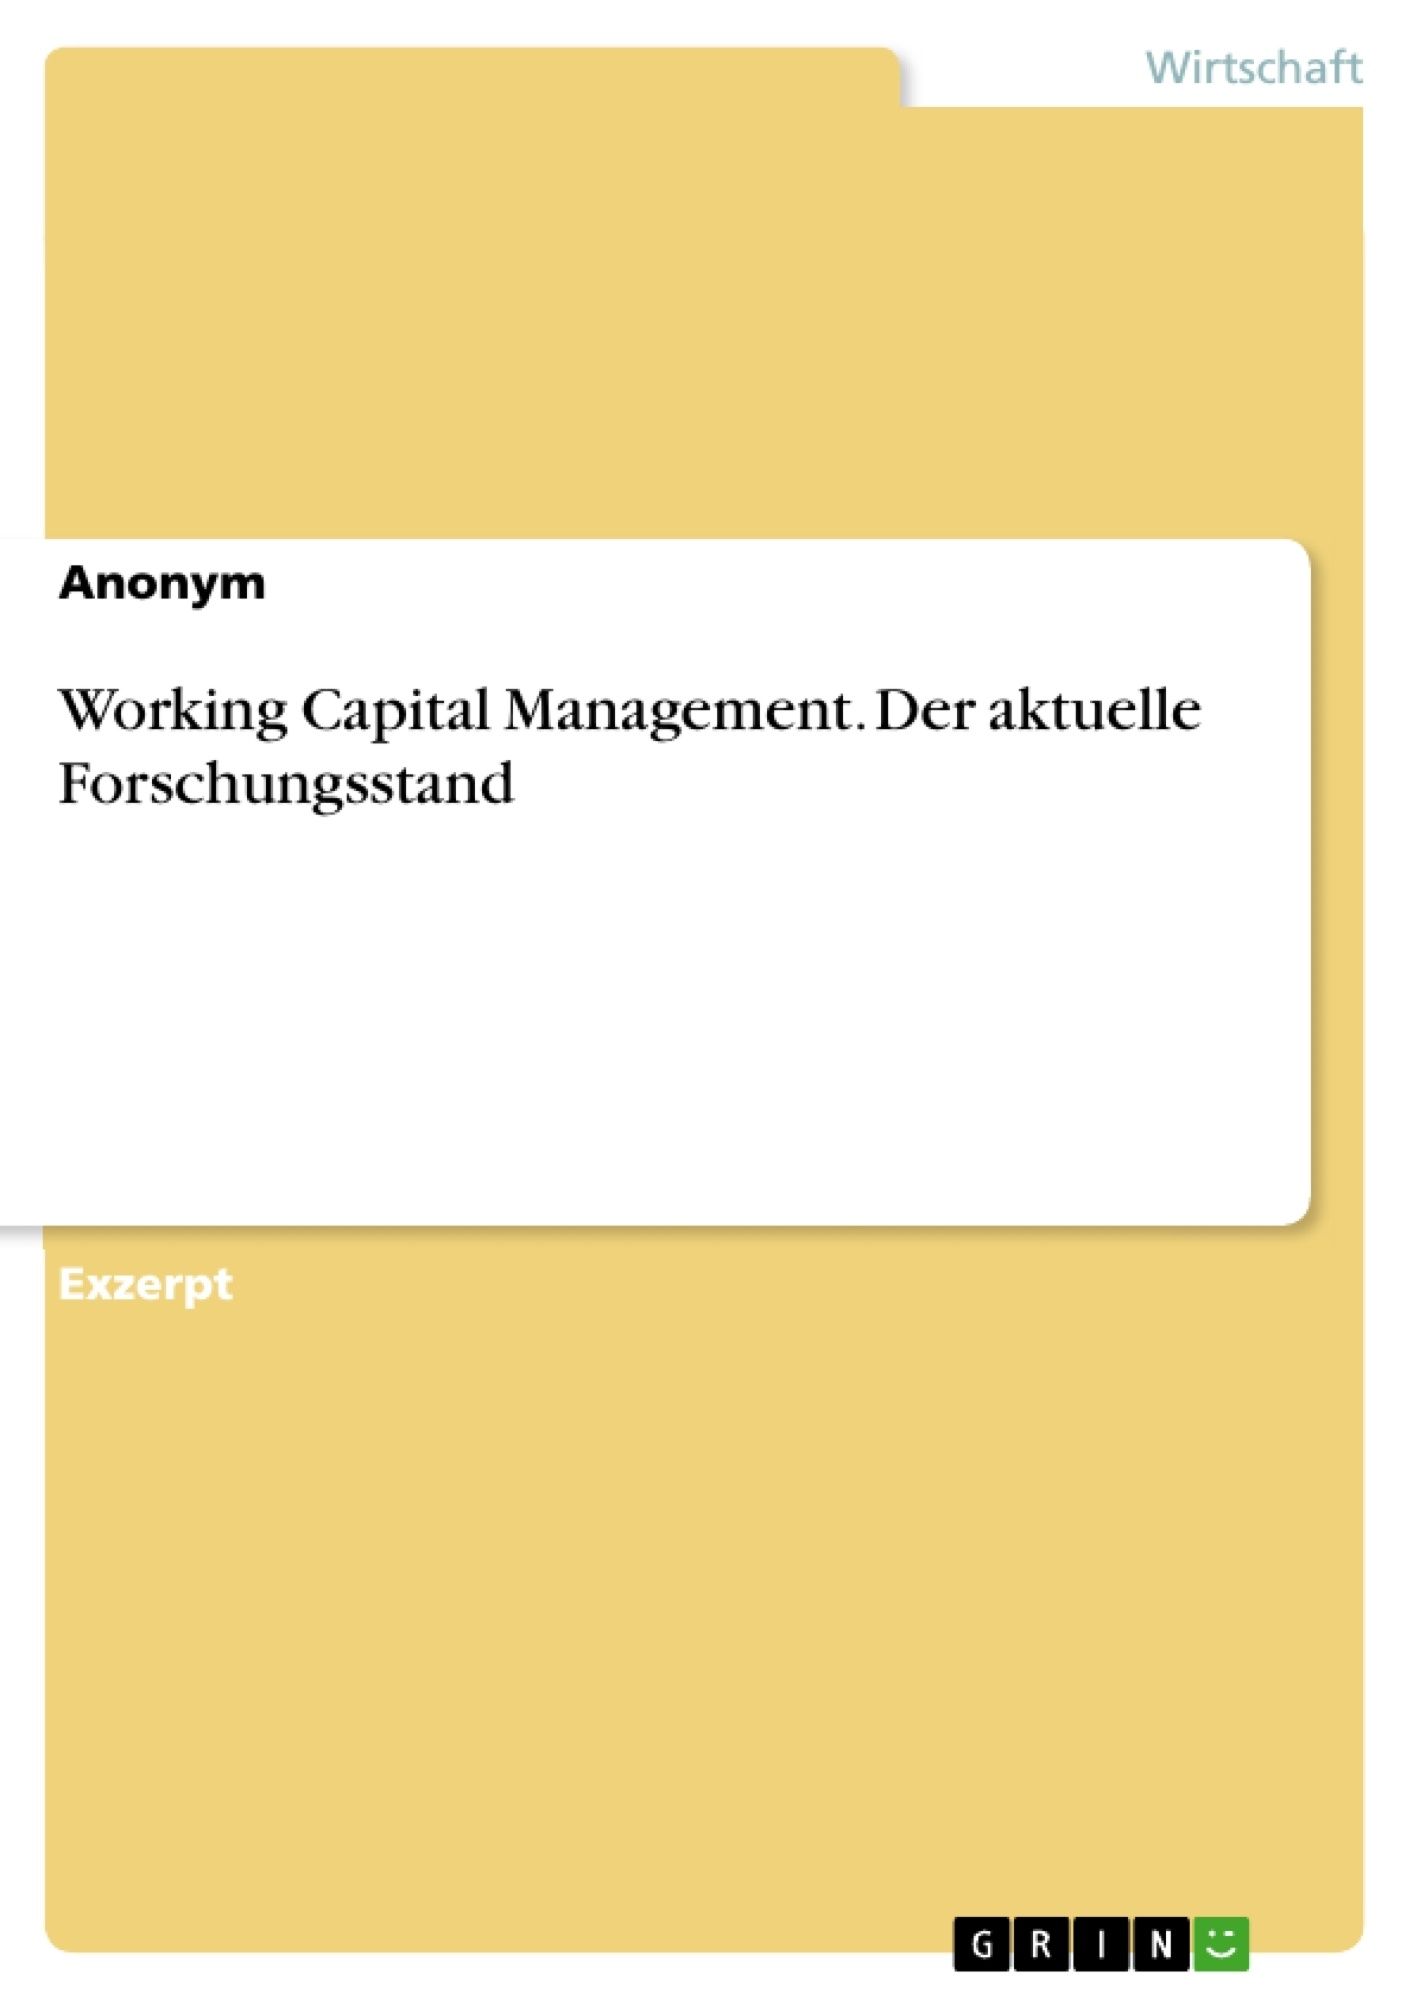 Titel: Working Capital Management. Der aktuelle Forschungsstand